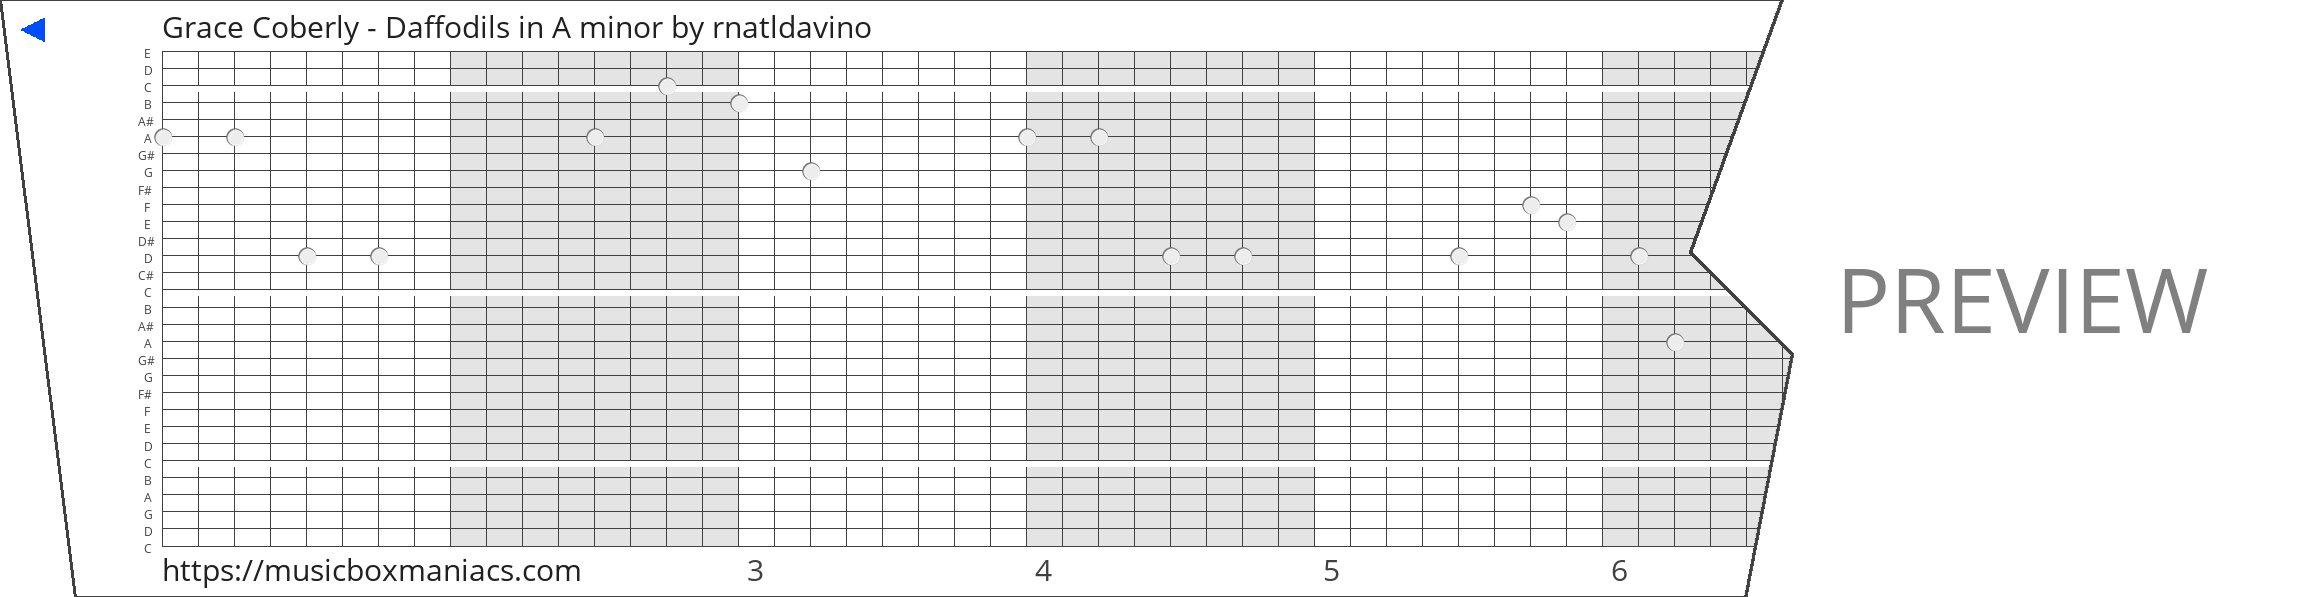 Grace Coberly - Daffodils in A minor 30 note music box paper strip